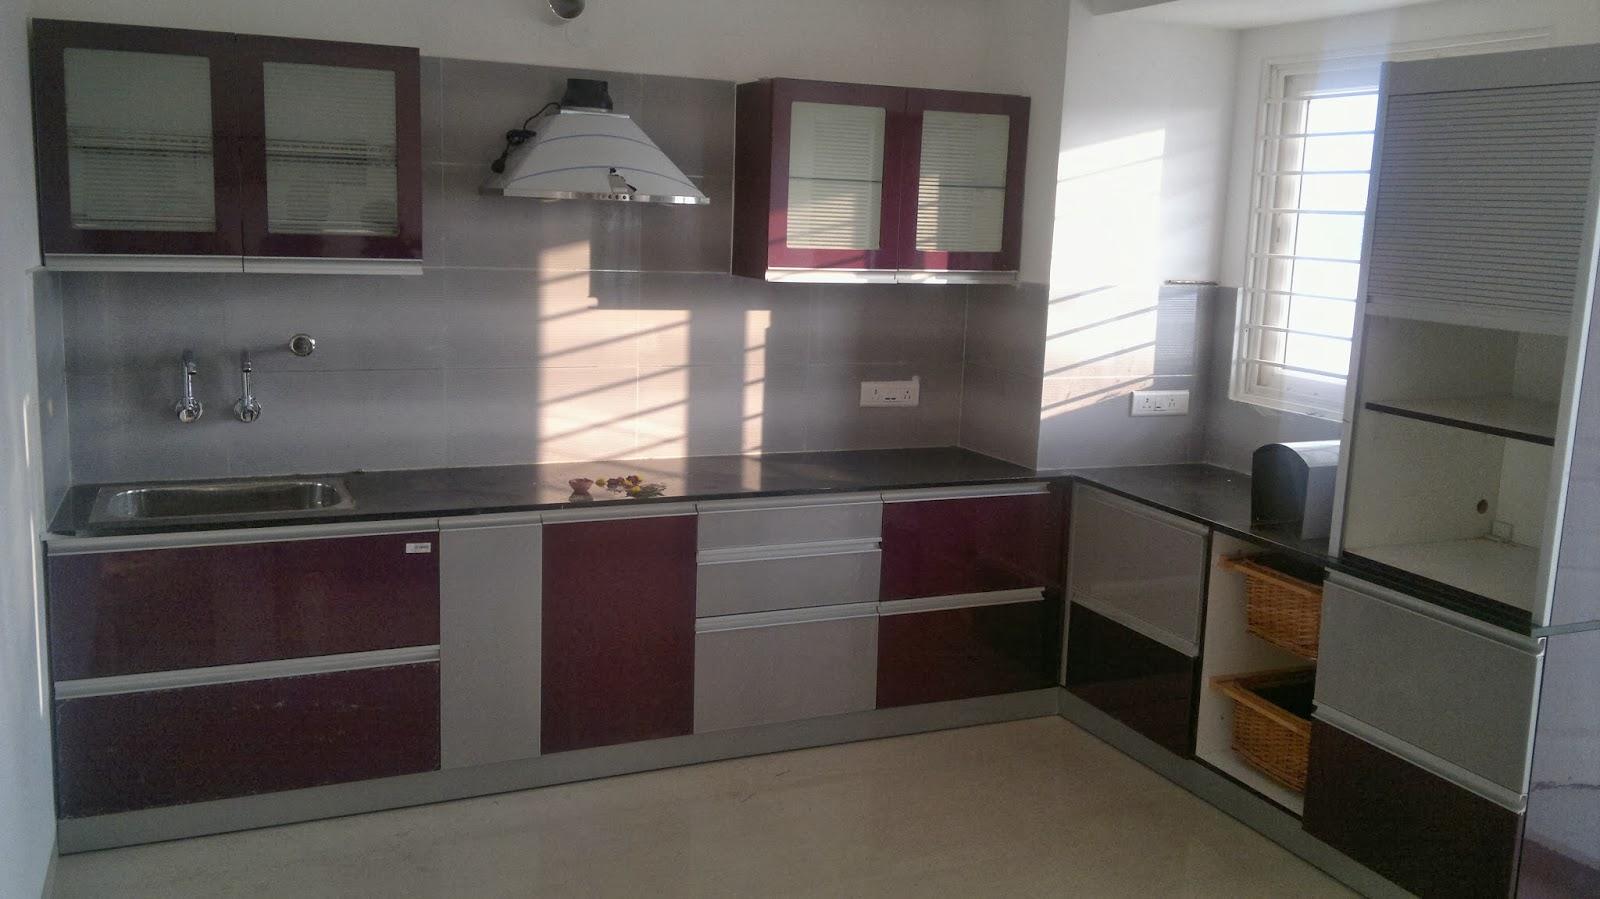 8 Streaks QUALITY VALUE SERVICE Modular Kitchen Store  Hyderabad  8 Streaks